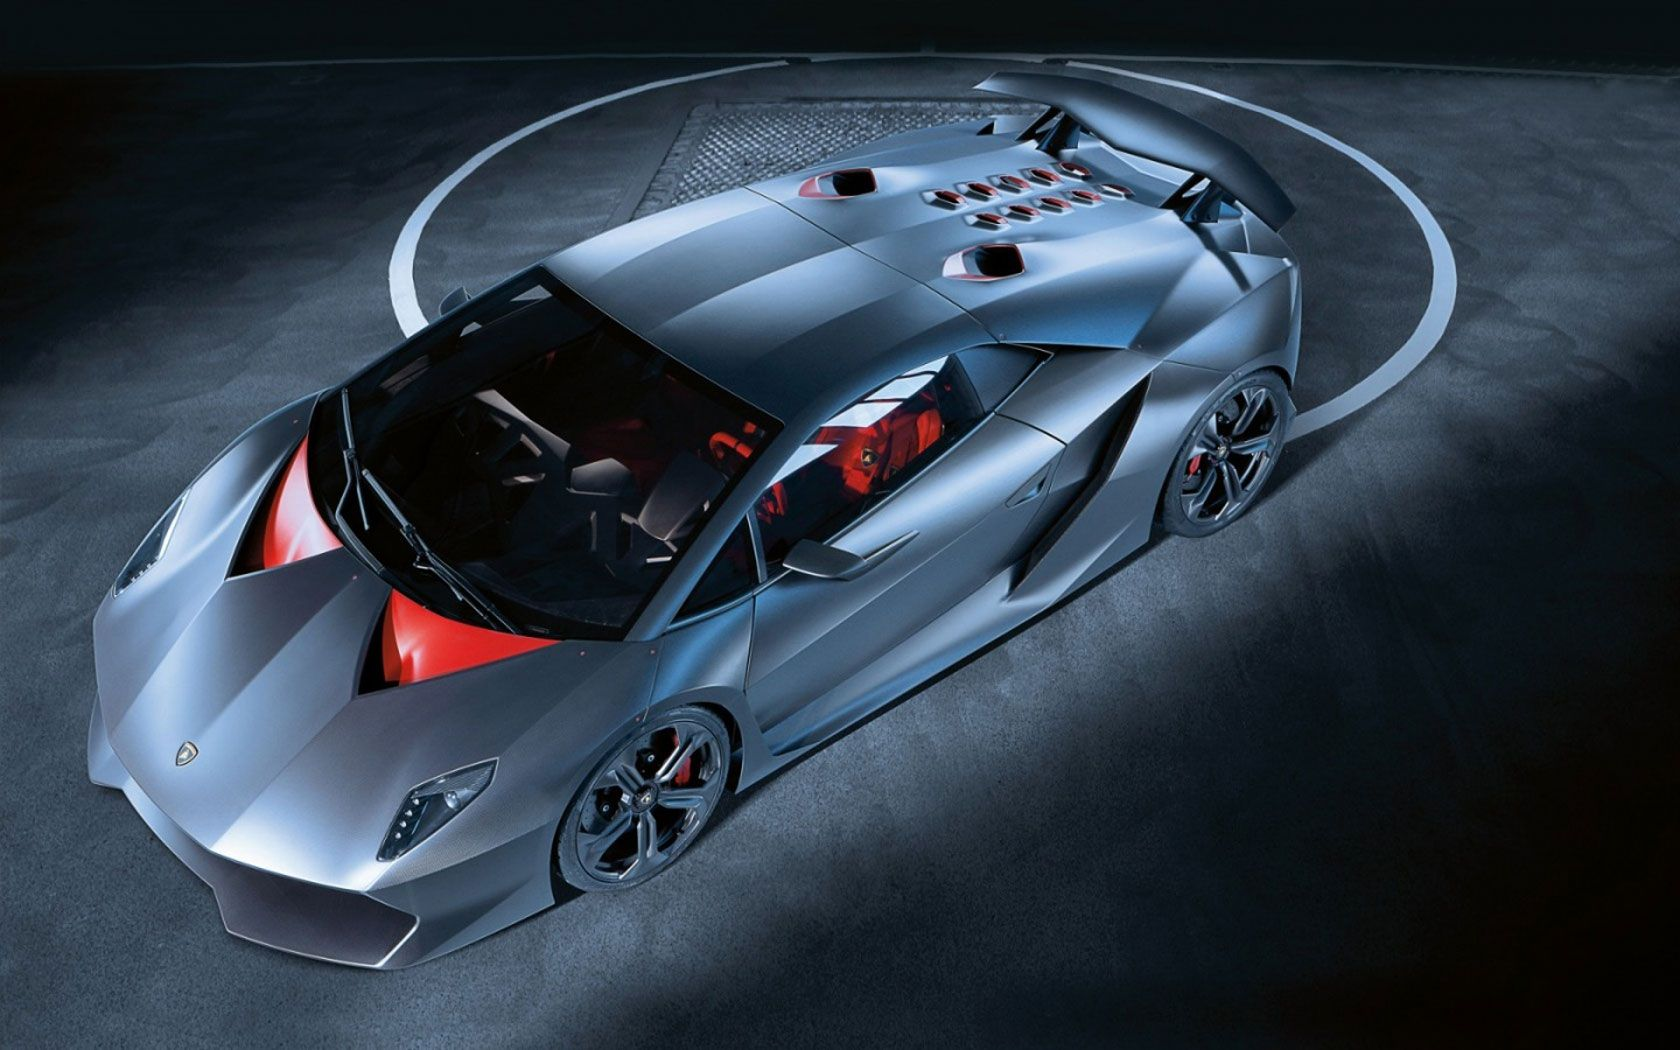 El Nuevo Lamborghini El Sesto Elemento Es El Puto Batmovil